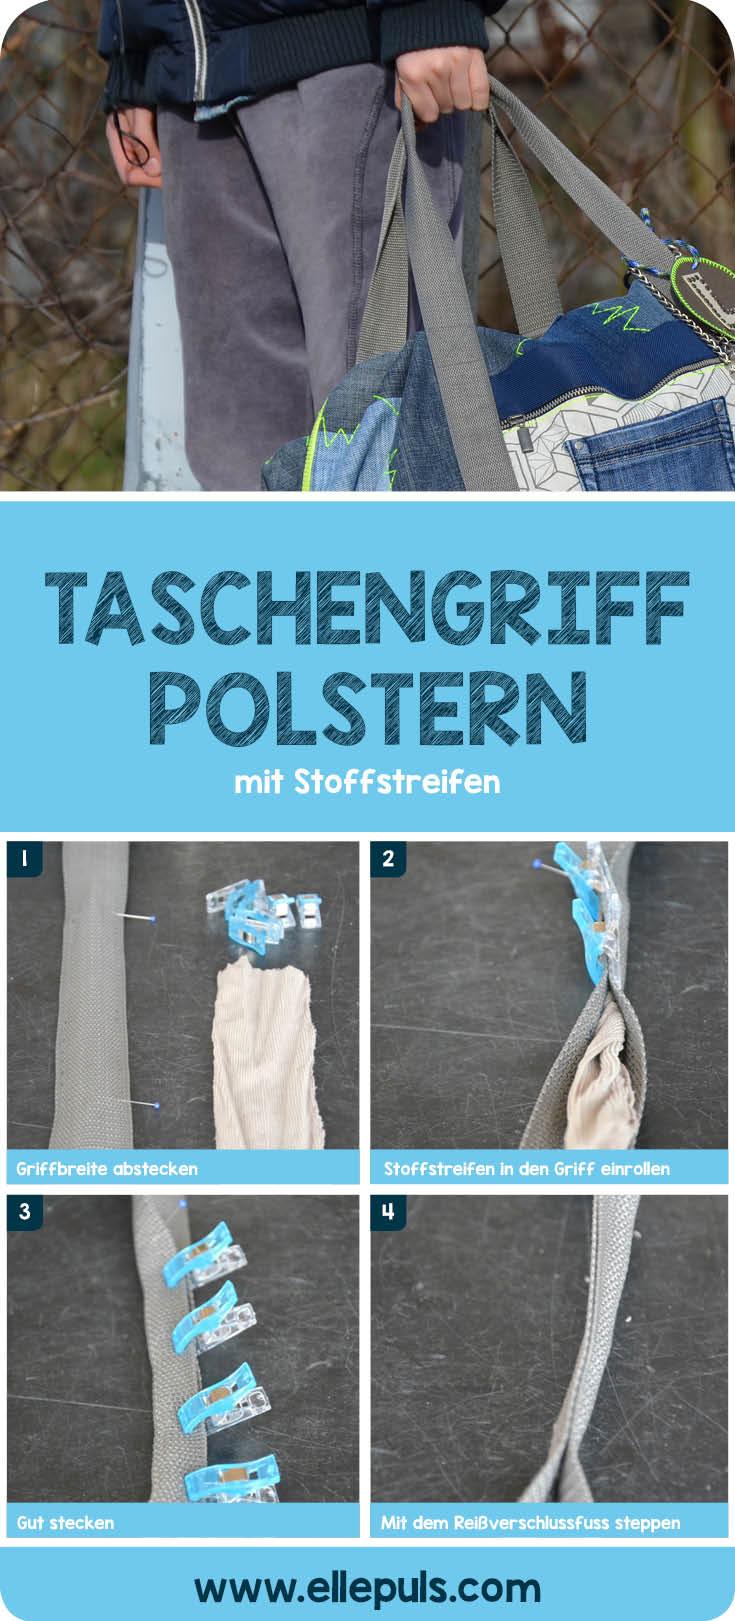 Taschengriff_polstern_Weekender